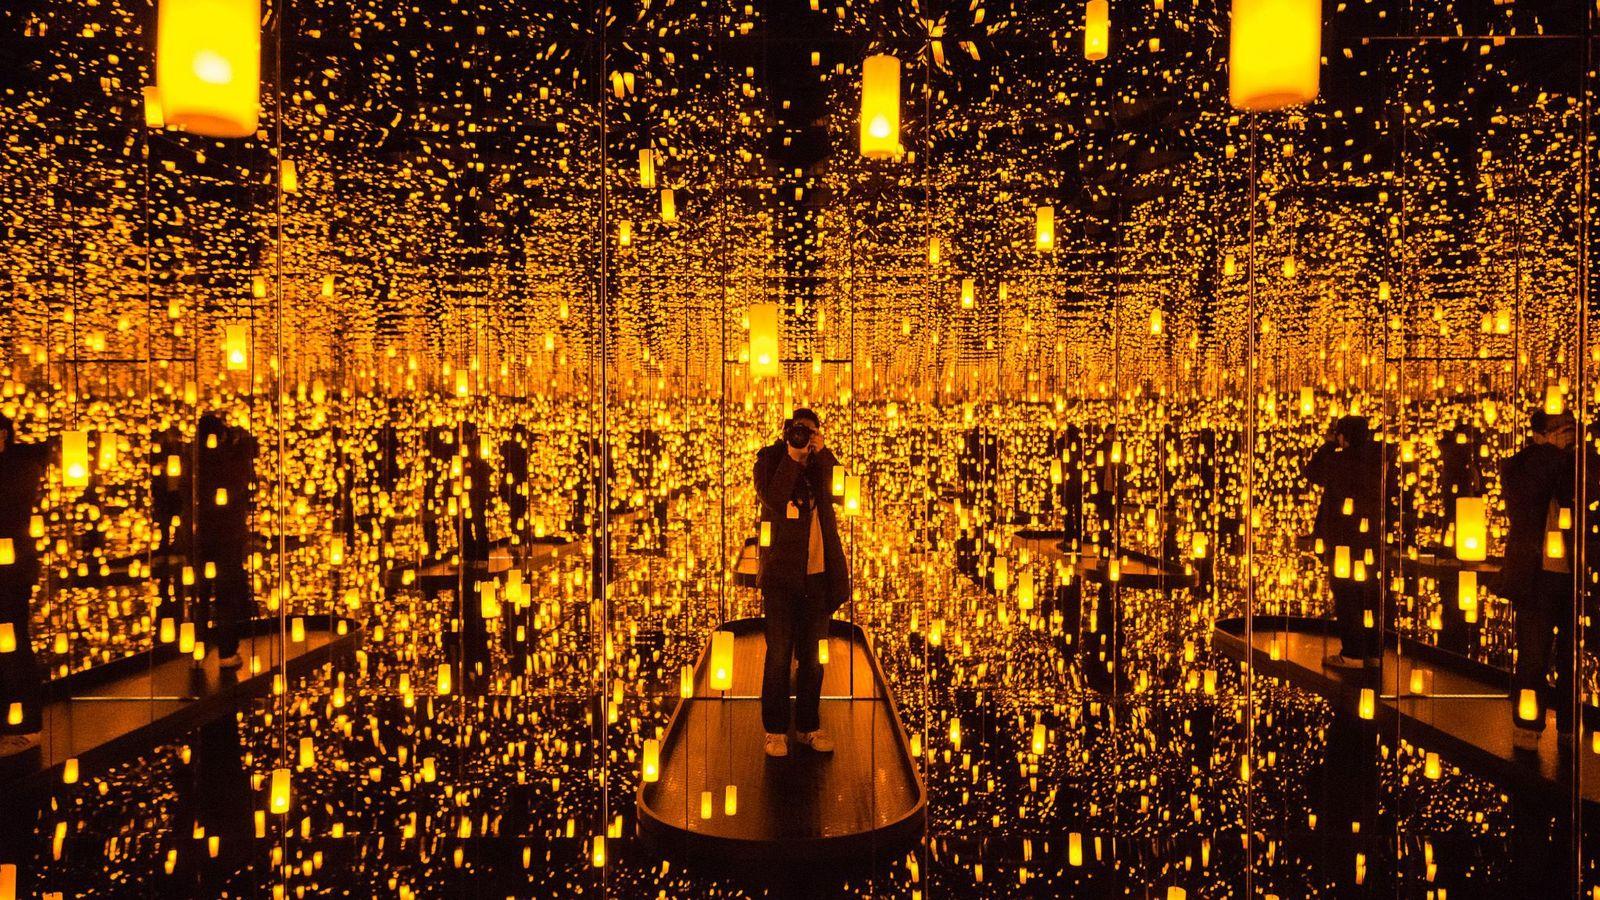 Museu Hirshhorn e Jardim de Esculturas, Washington D.C.